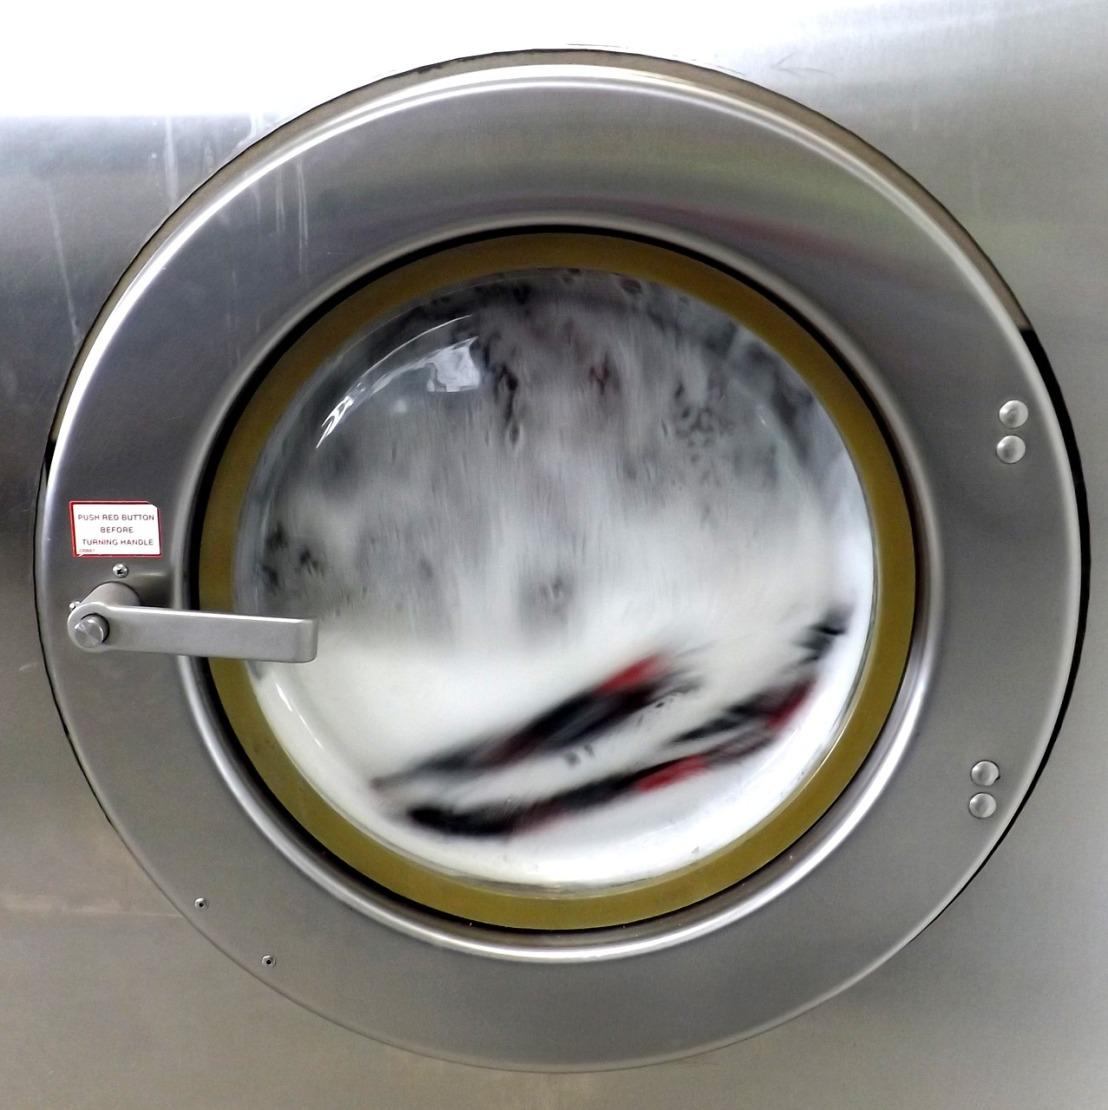 laundromat-1567859_1280